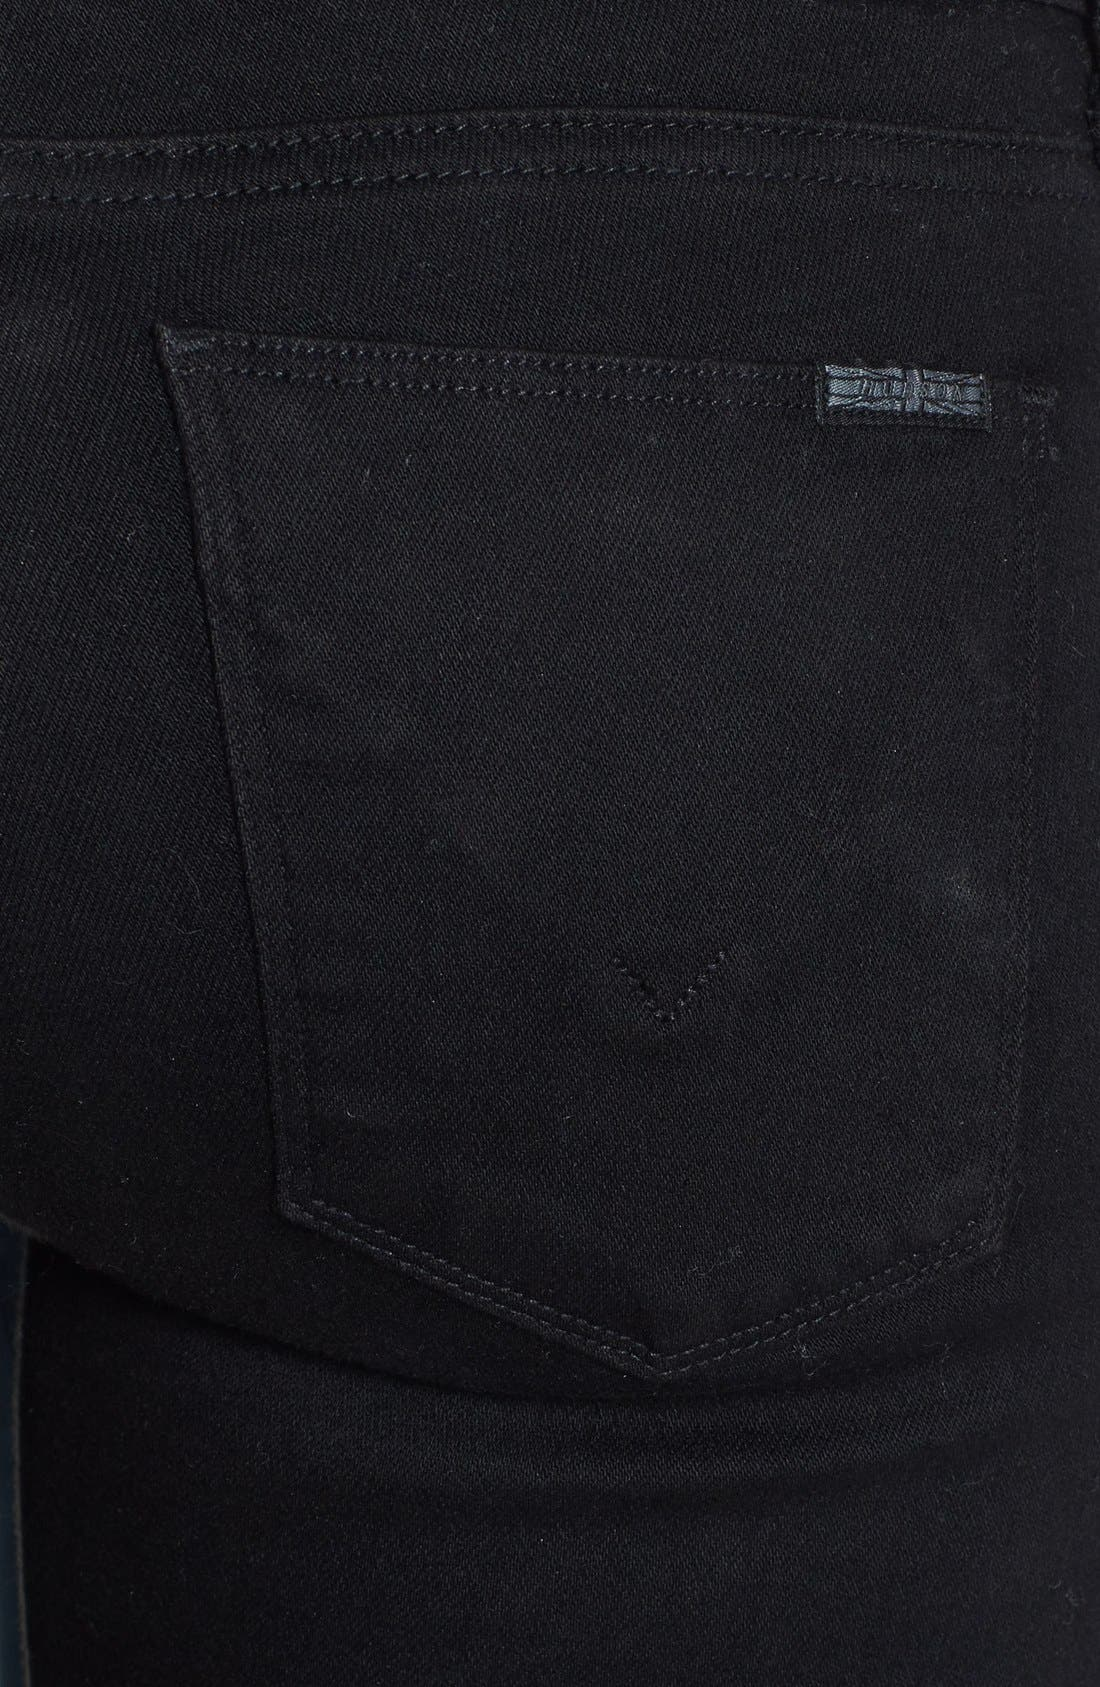 Alternate Image 3  - Hudson Jeans 'Krista' Super Skinny Jeans